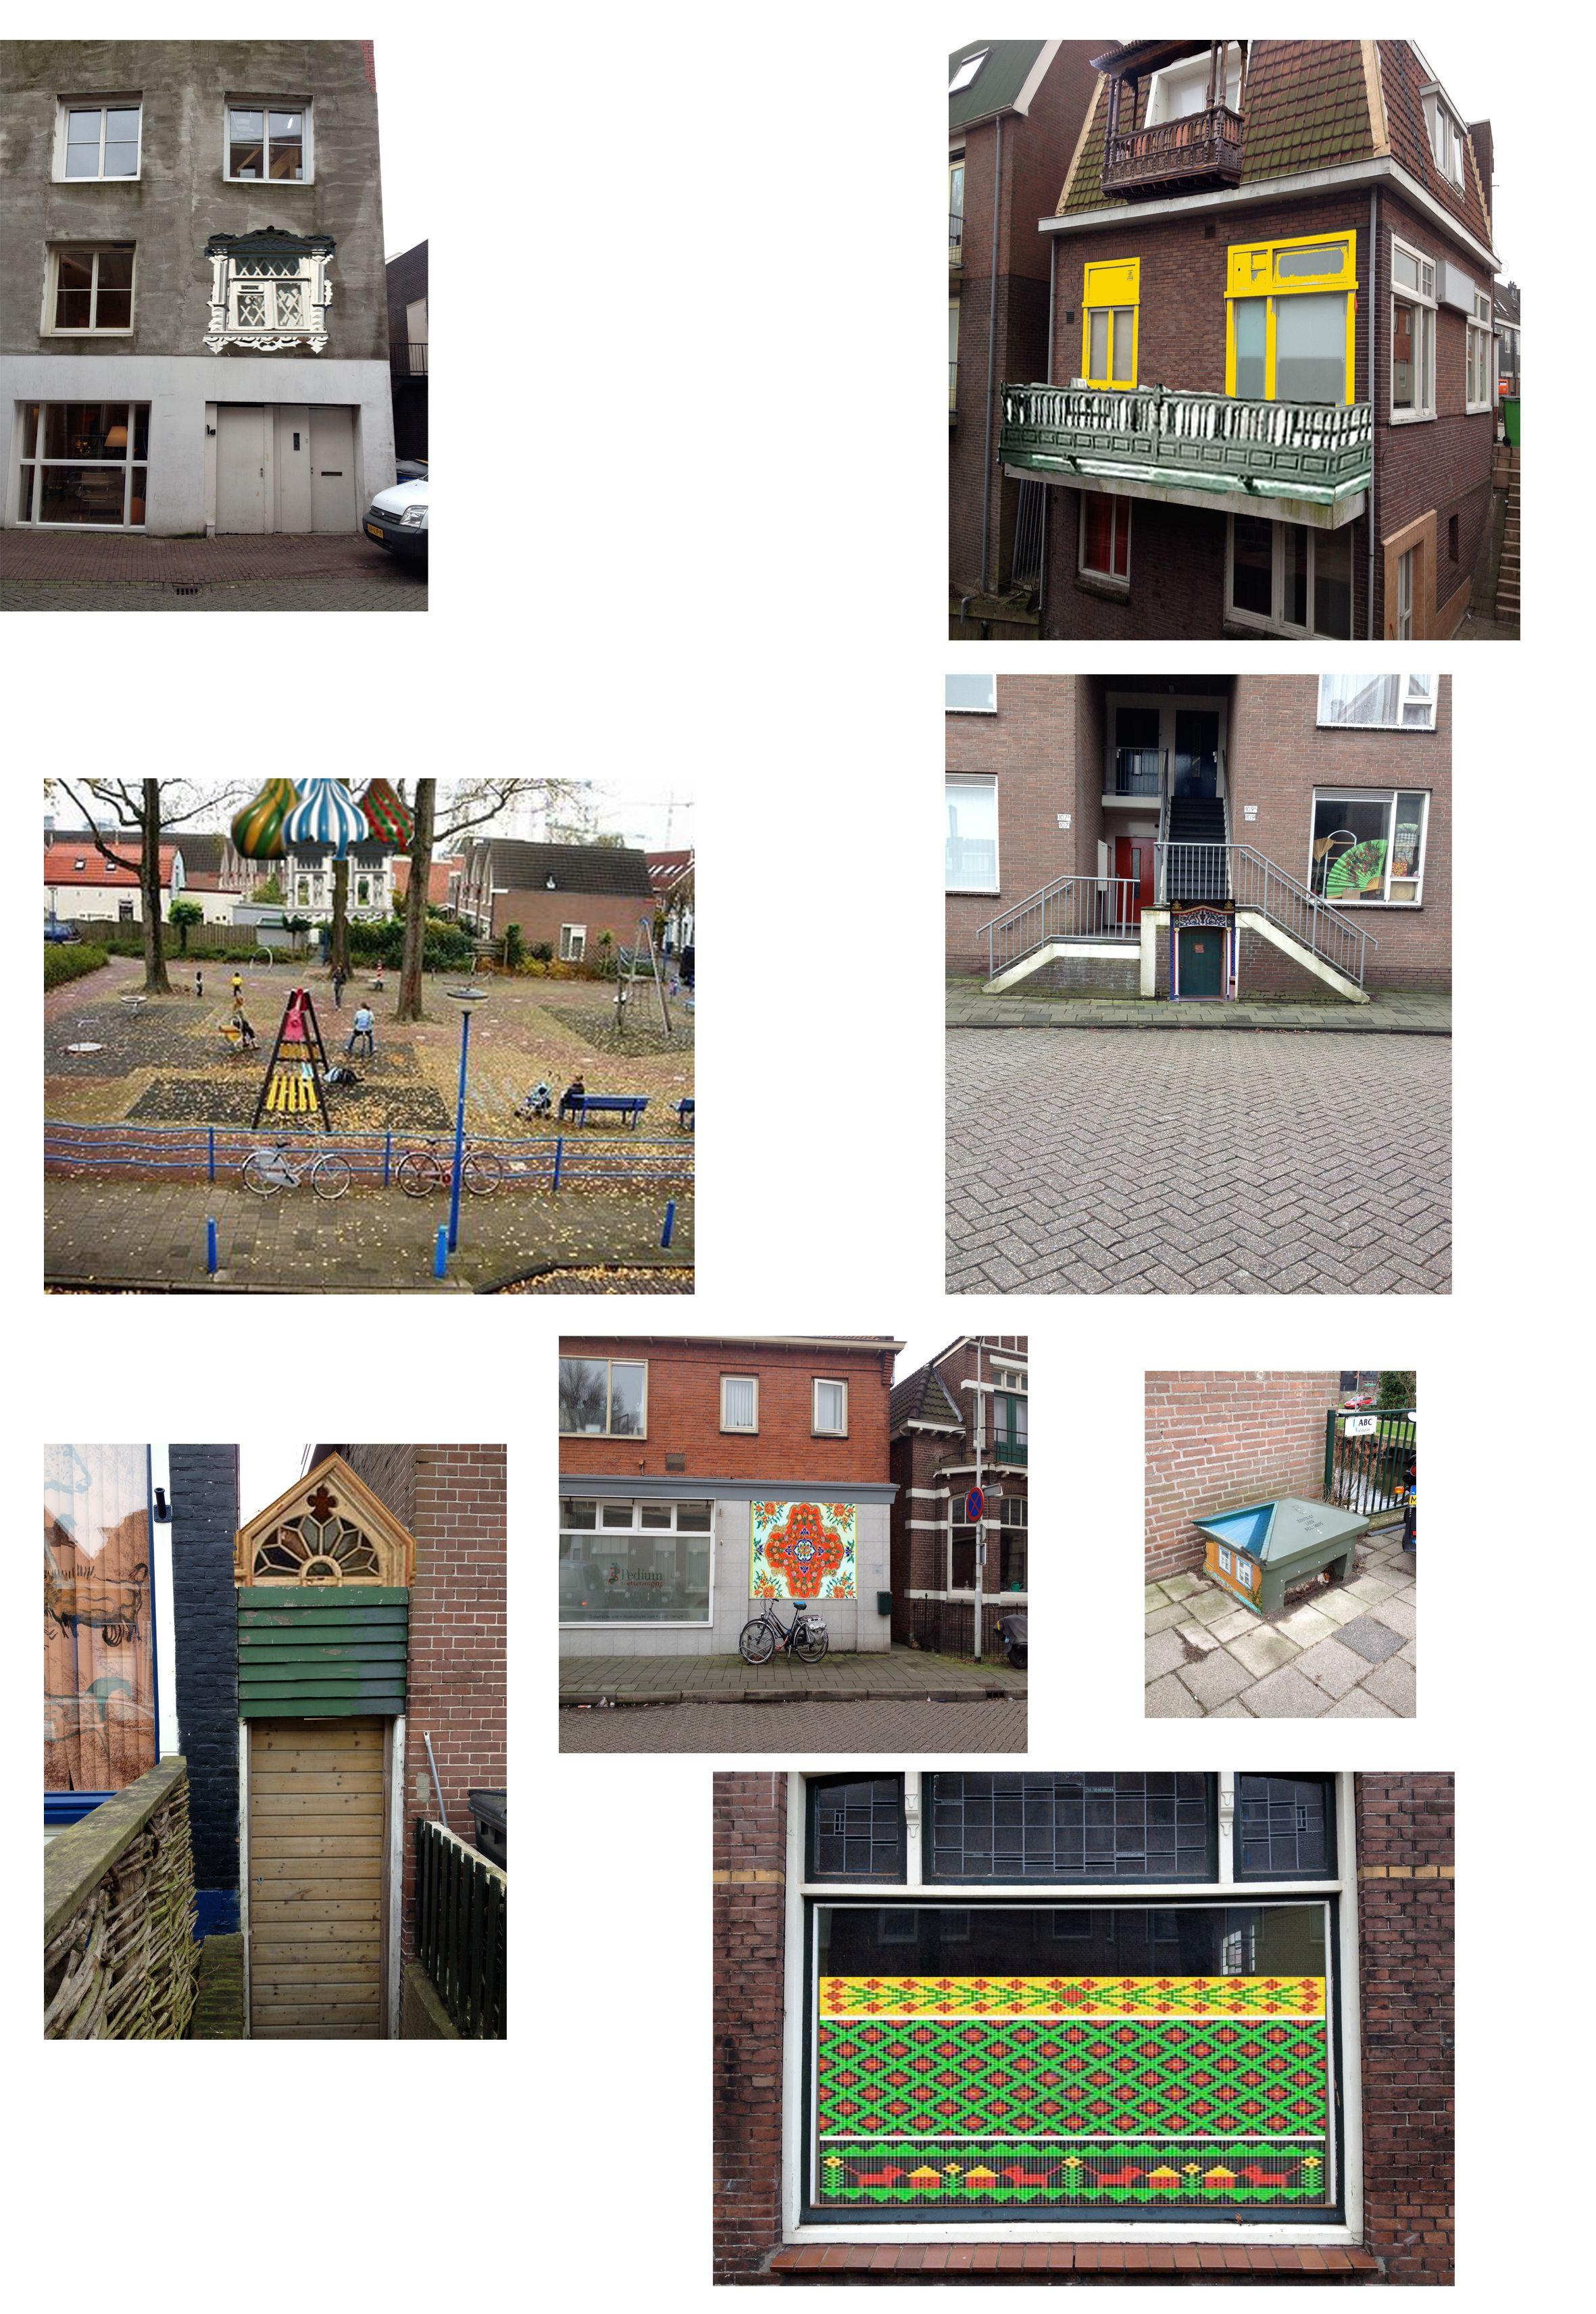 best images about dutch datsja datsja zaanstad on pinterest